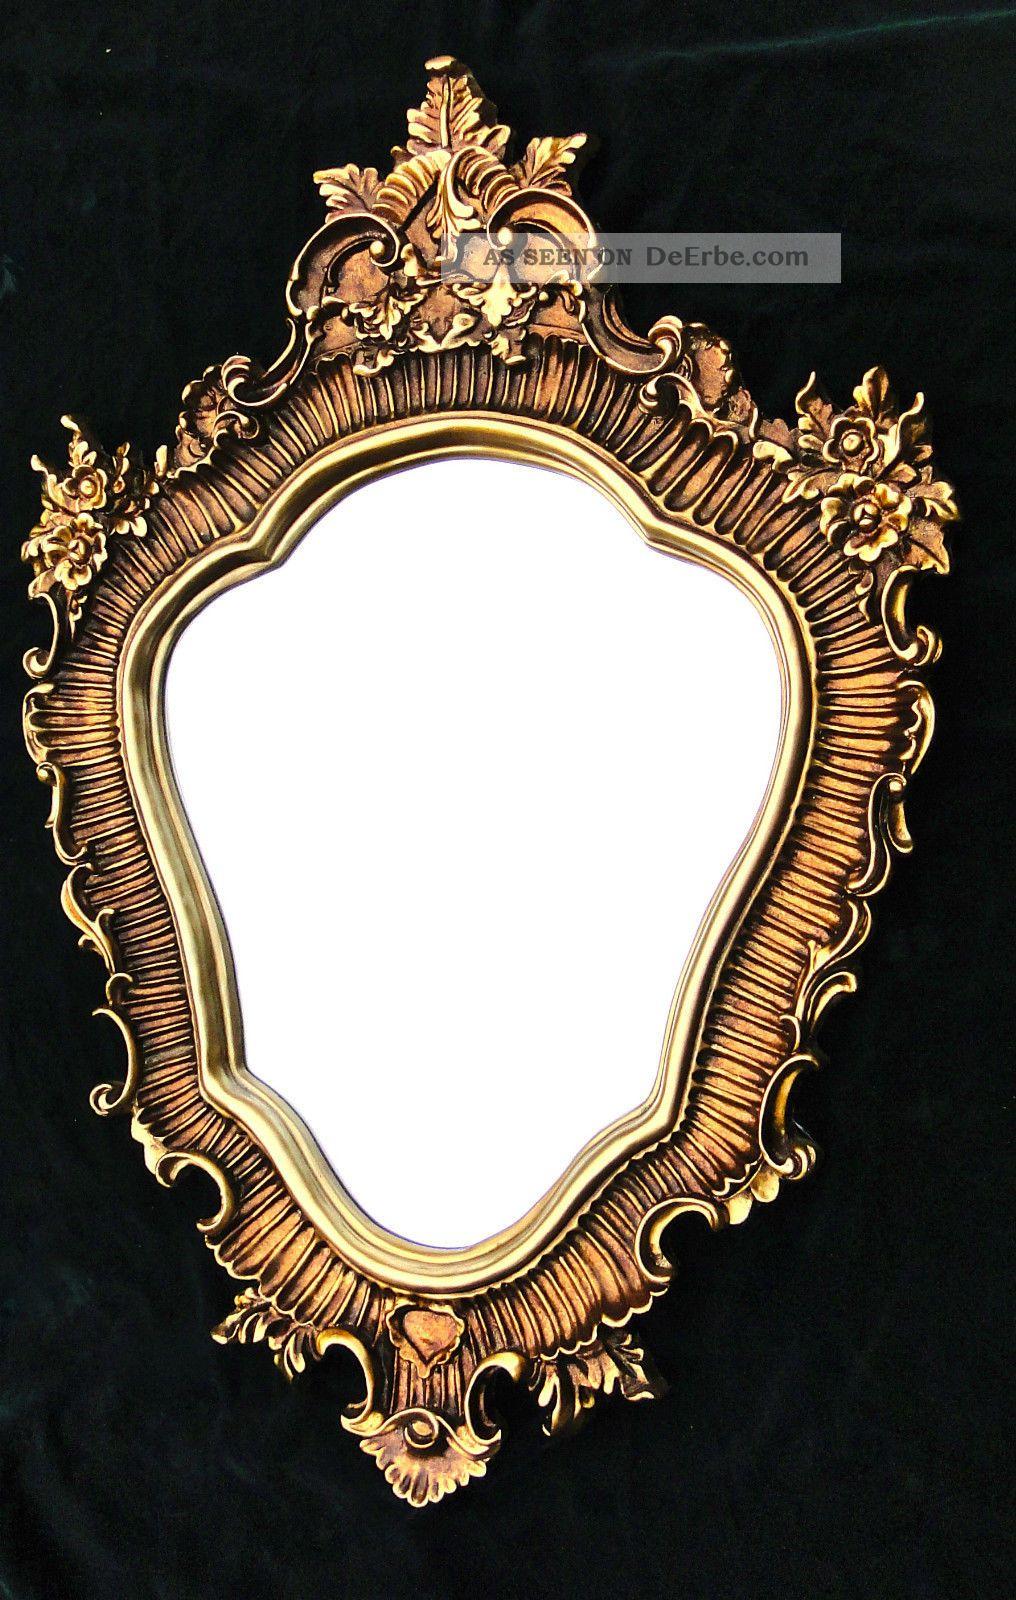 Großer Wandspiegel Barock Oval 103x73cm Badspiegel Antik Spiegel Gold Spiegel Bild